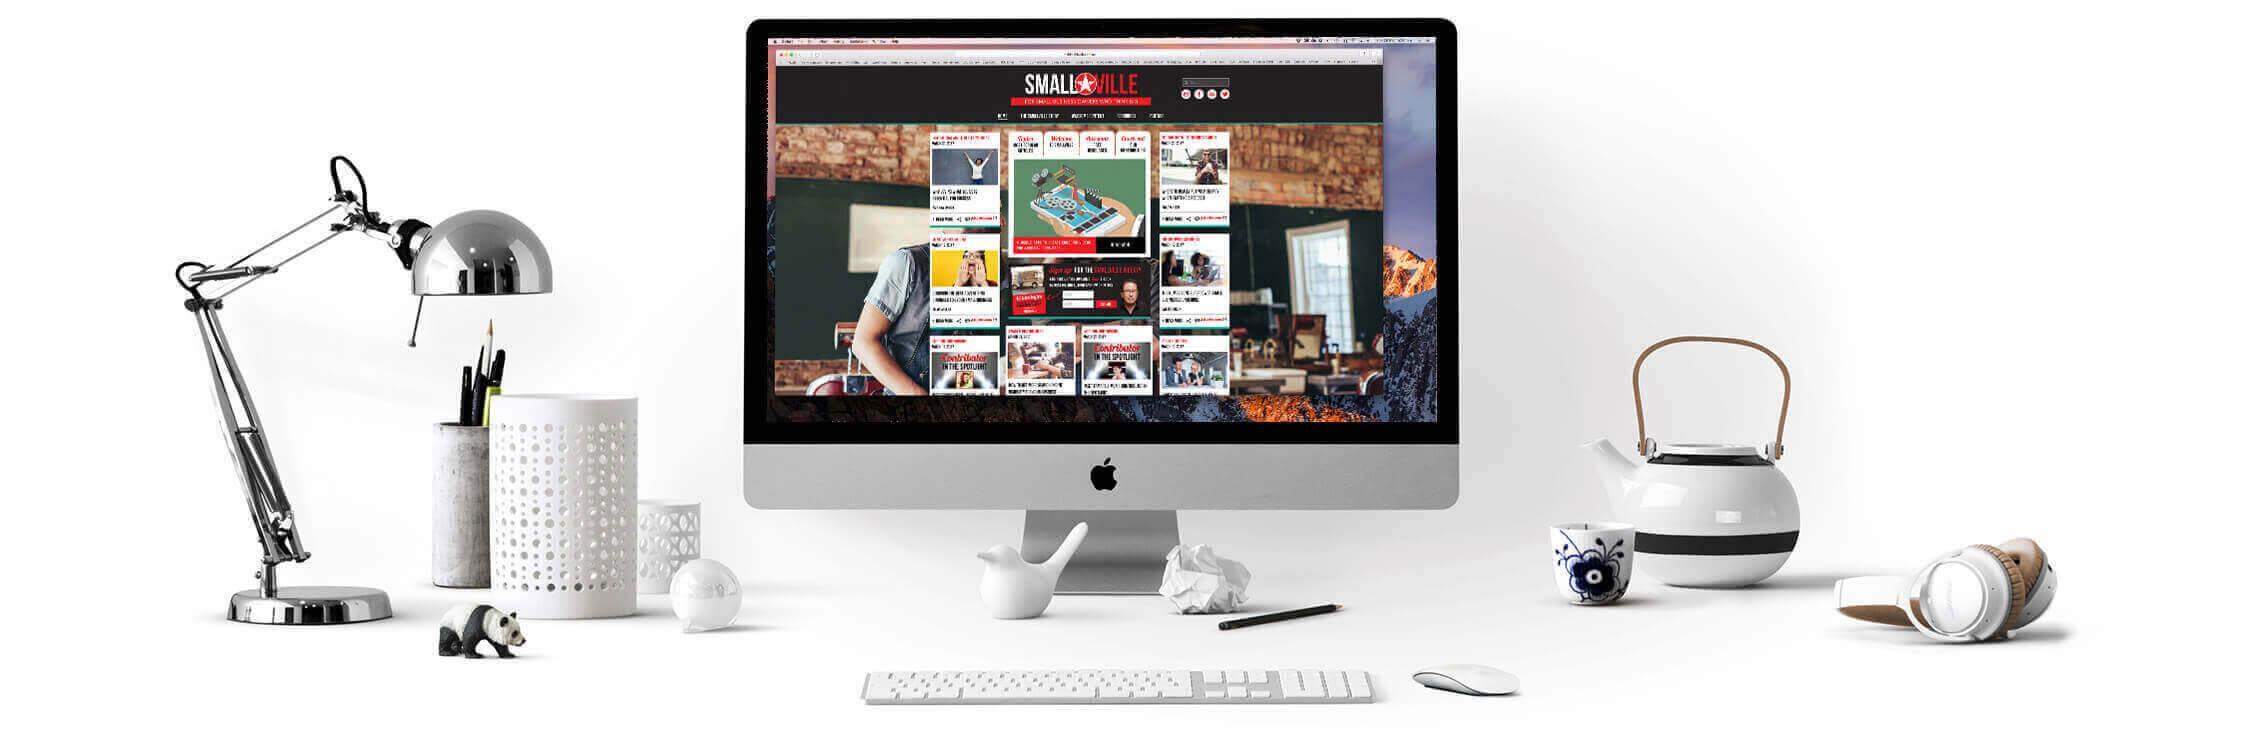 Web Design Cairns | eCommerce | SEO | Branding | Mahi Web